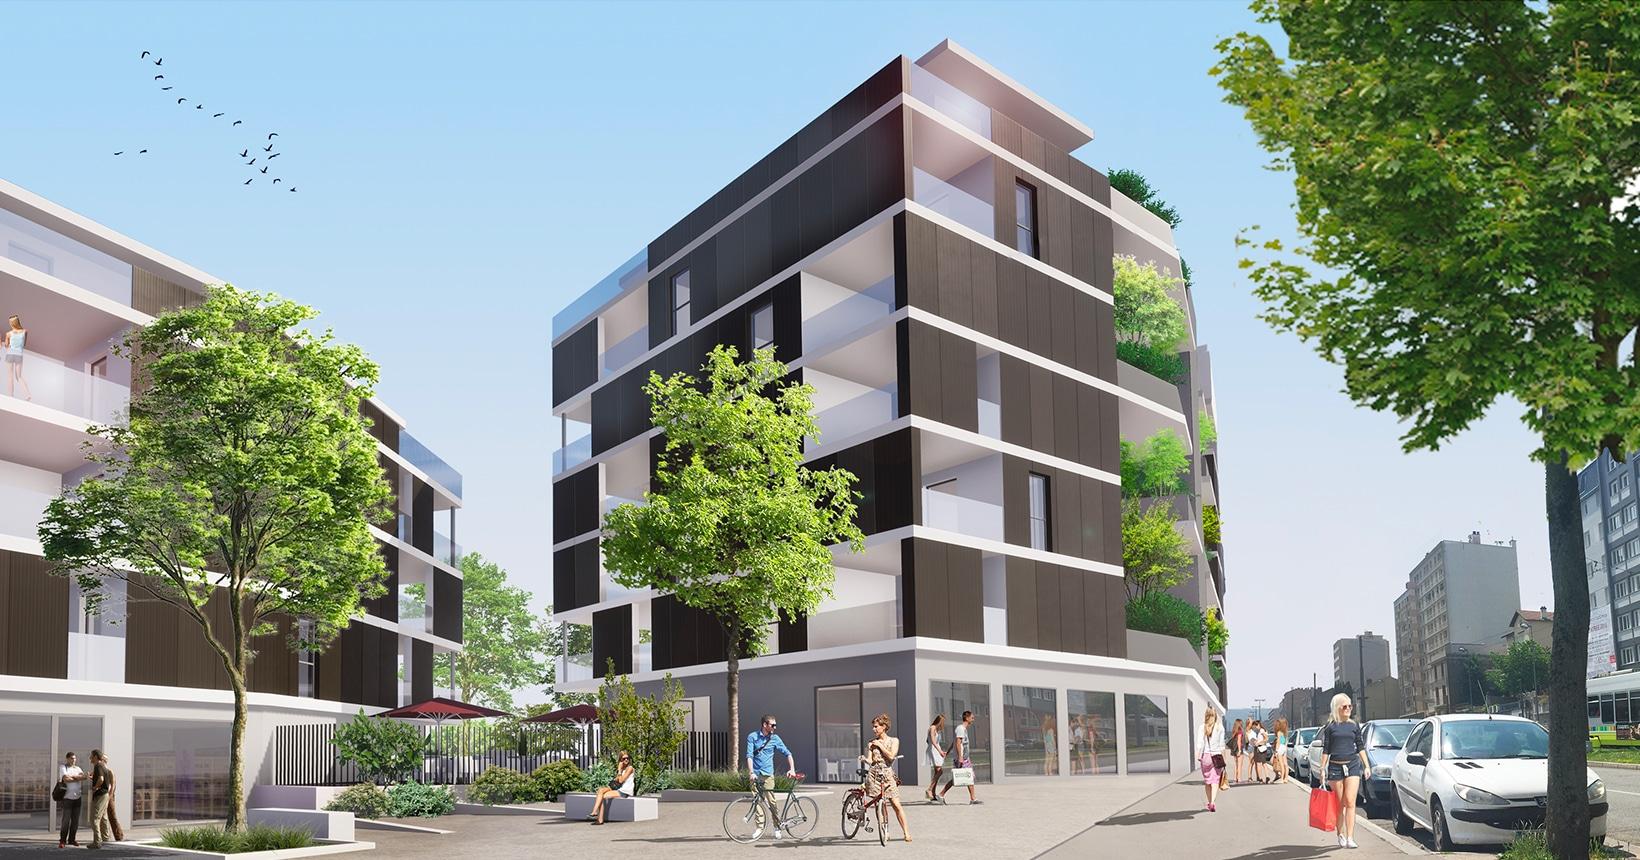 st-etienne-appartement-neuf-rue-bergson-42-pinel-investissement-t2-t3-t4-t5